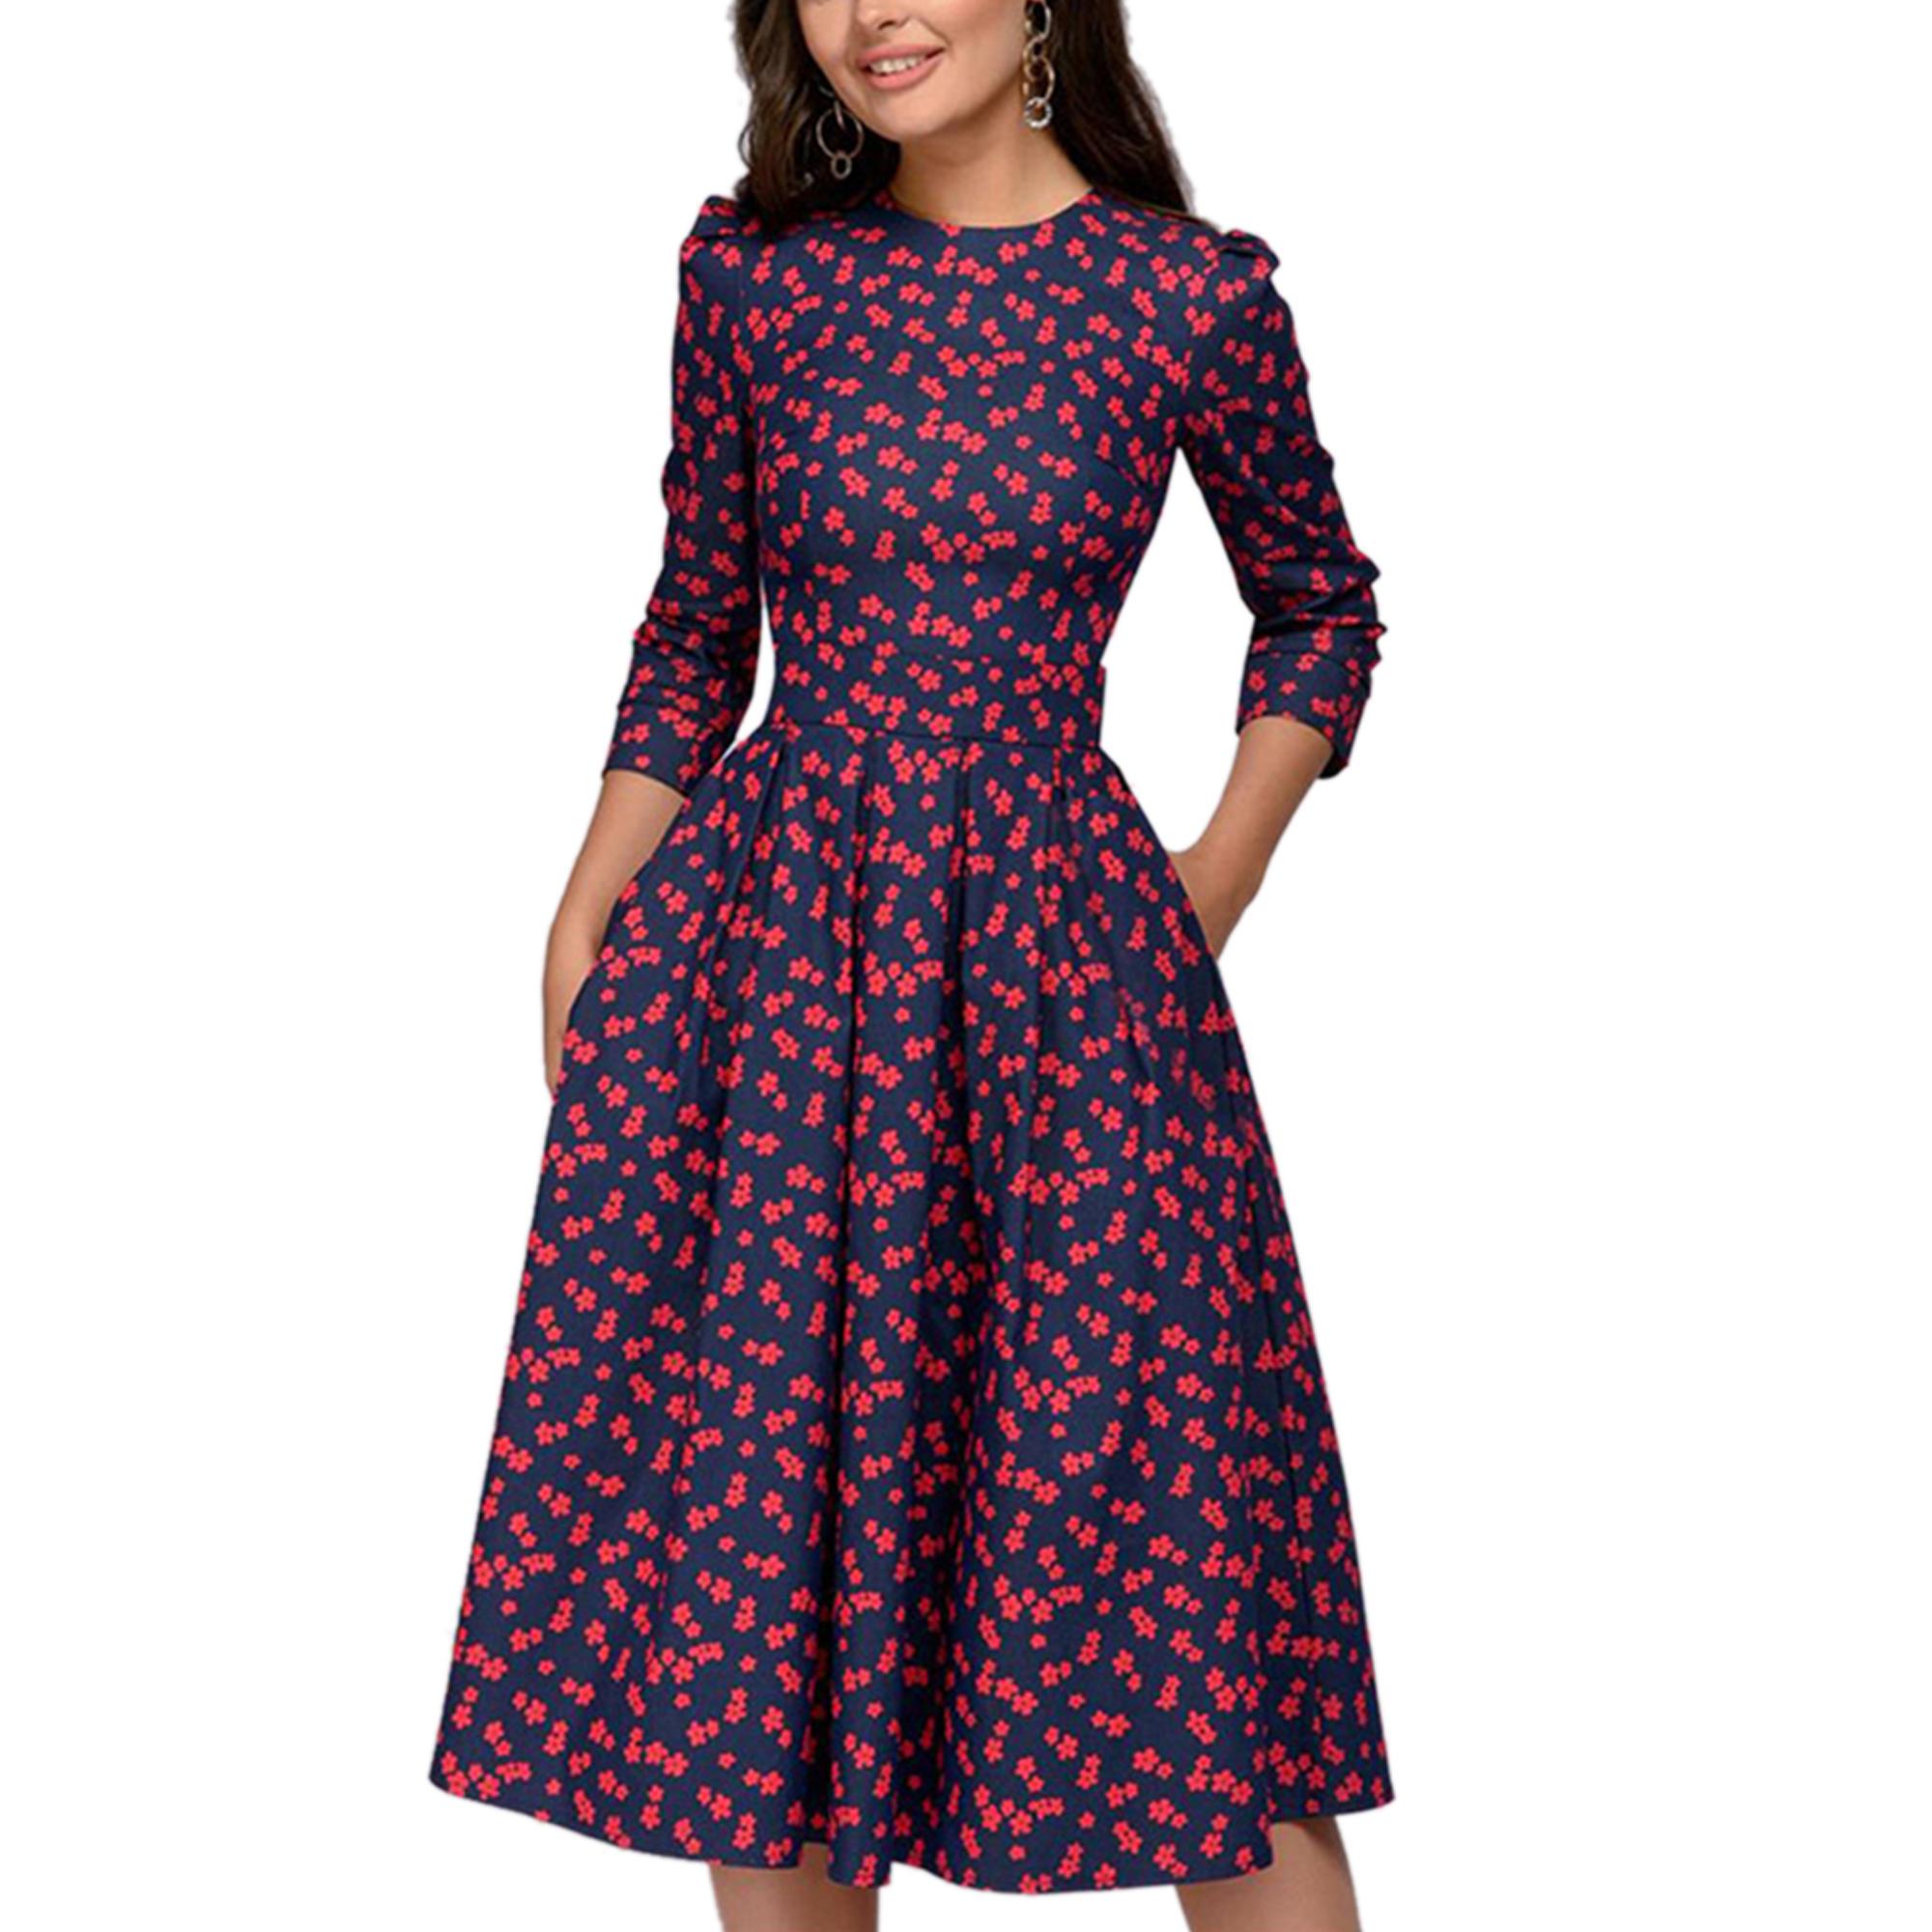 Merqwadd Merqwadd Womens Floral Printed Tunic Flared Midi Dress Walmart Com In 2021 Vintage Dresses Party Dress Long Sleeve Women S Fashion Dresses [ 2000 x 2000 Pixel ]